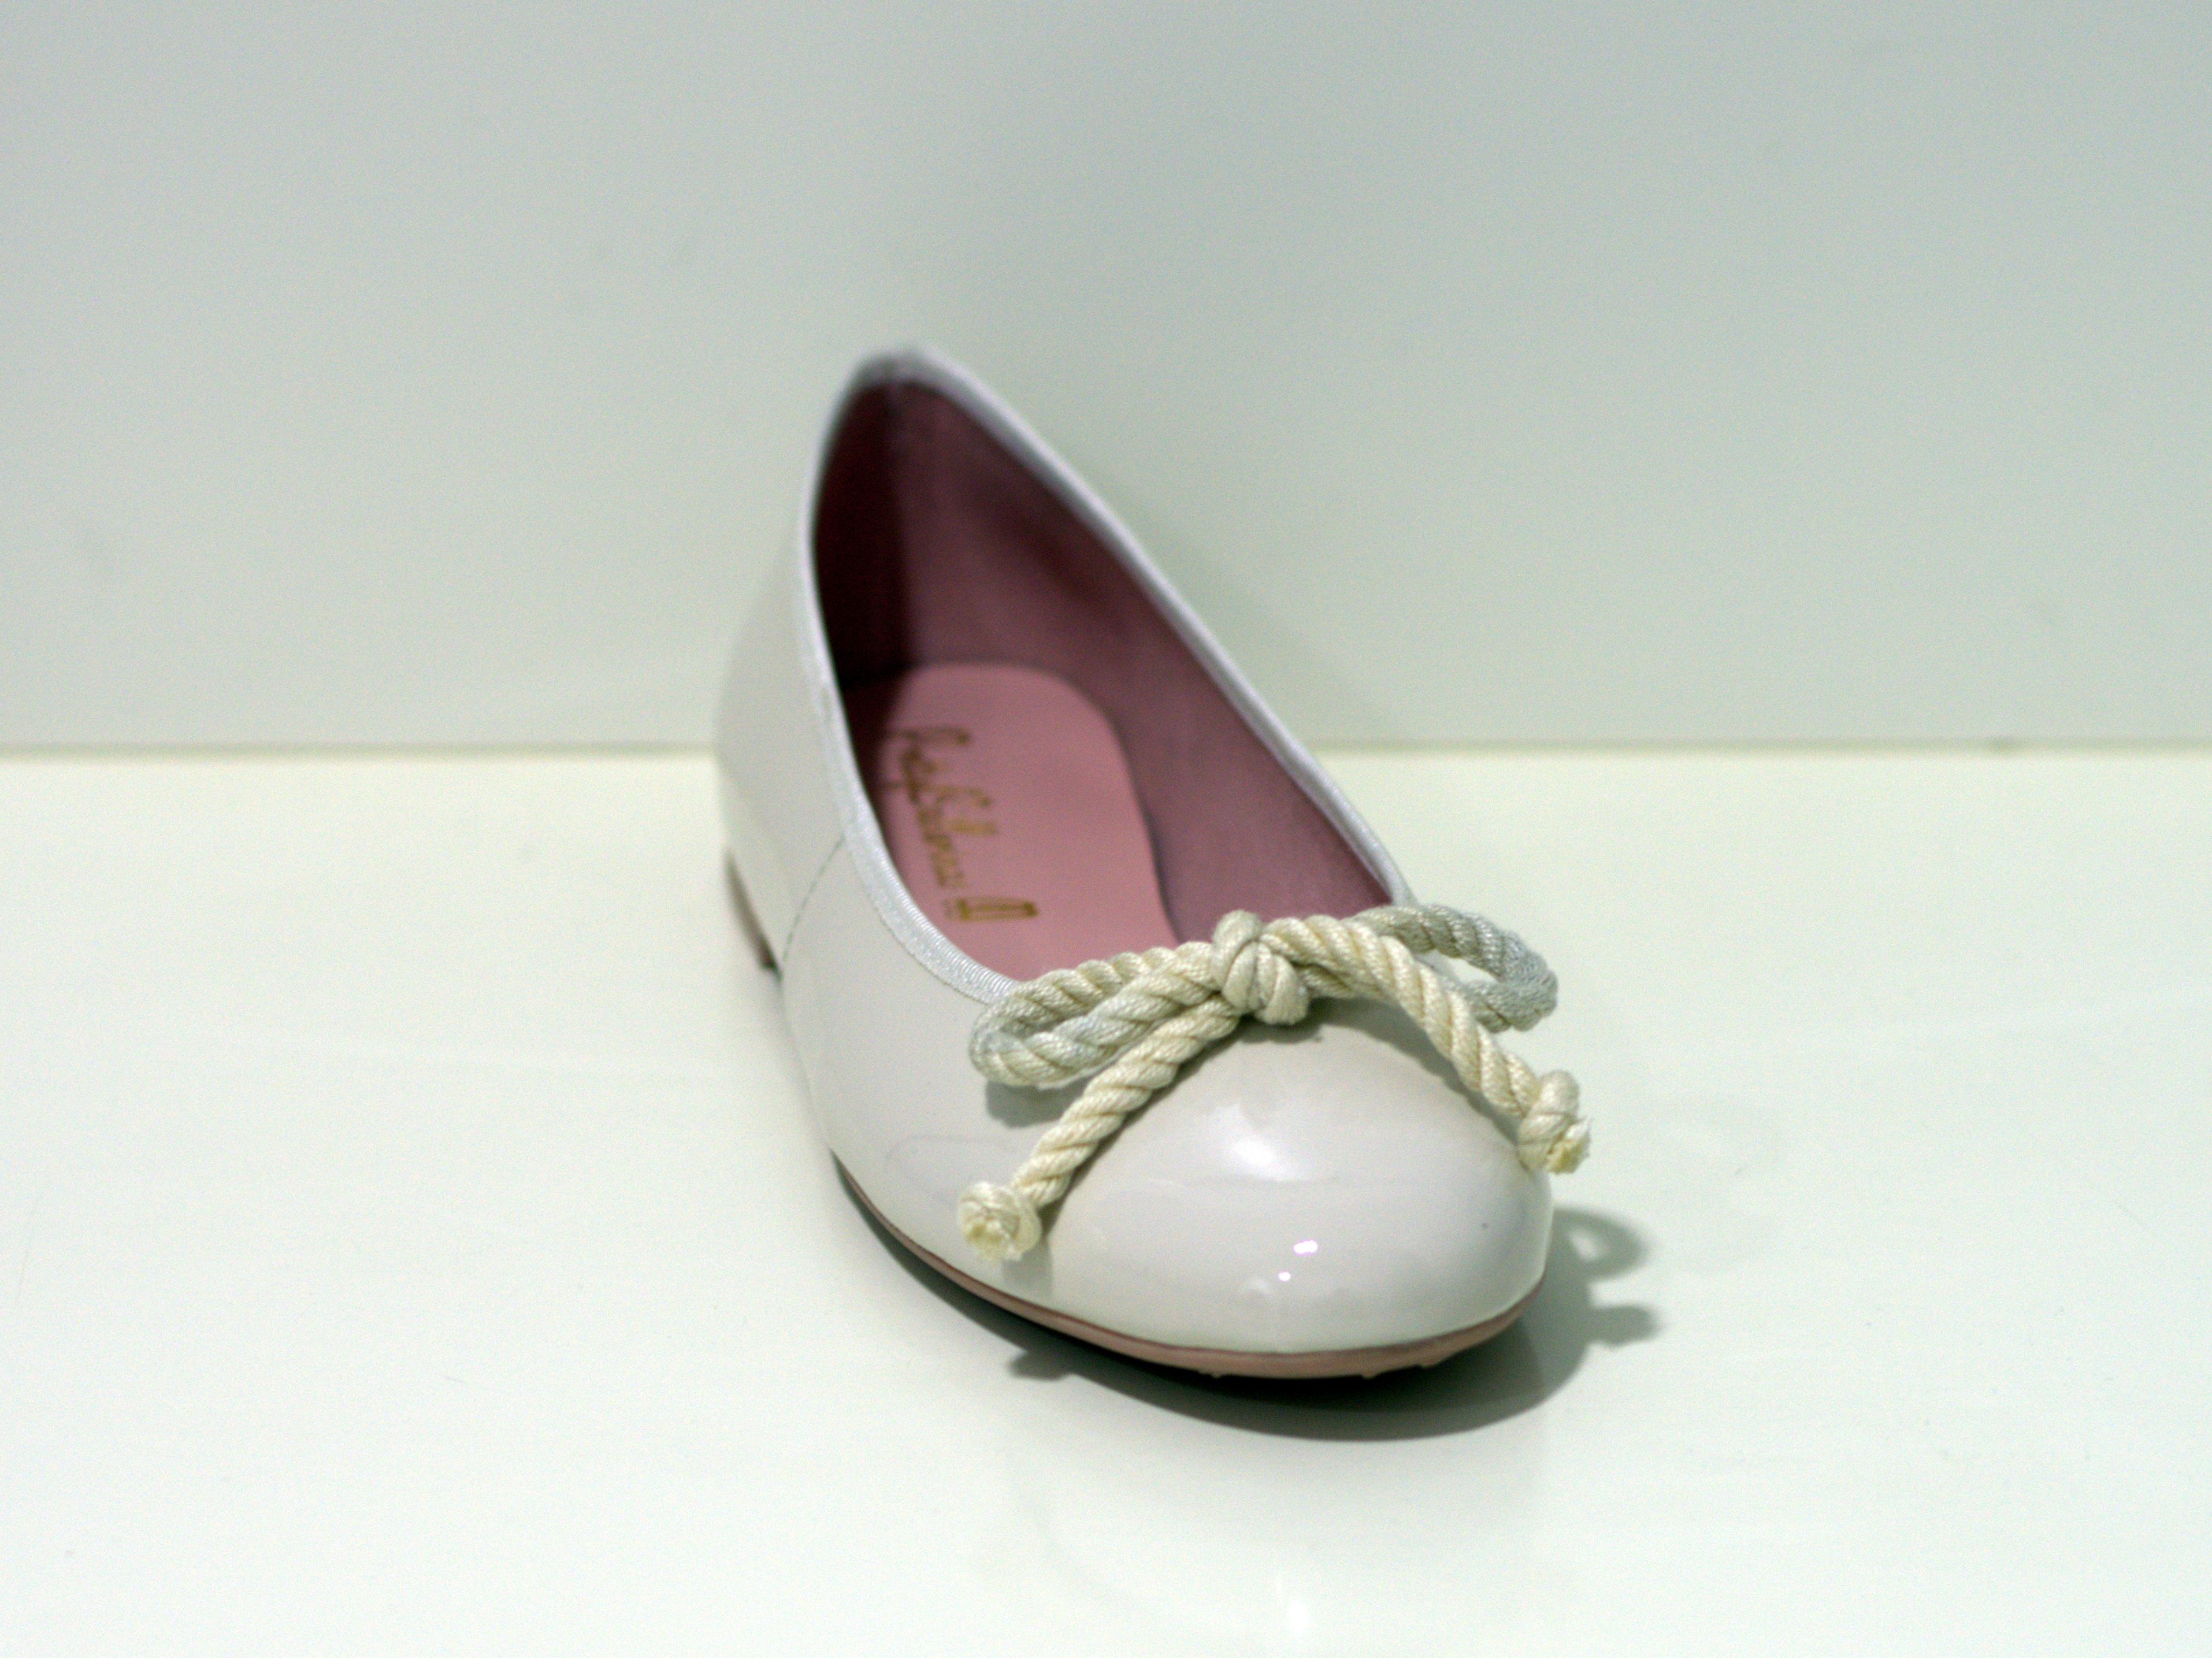 Pretty Ballerinas Nicole - Klassischer Ballerina Shade of White